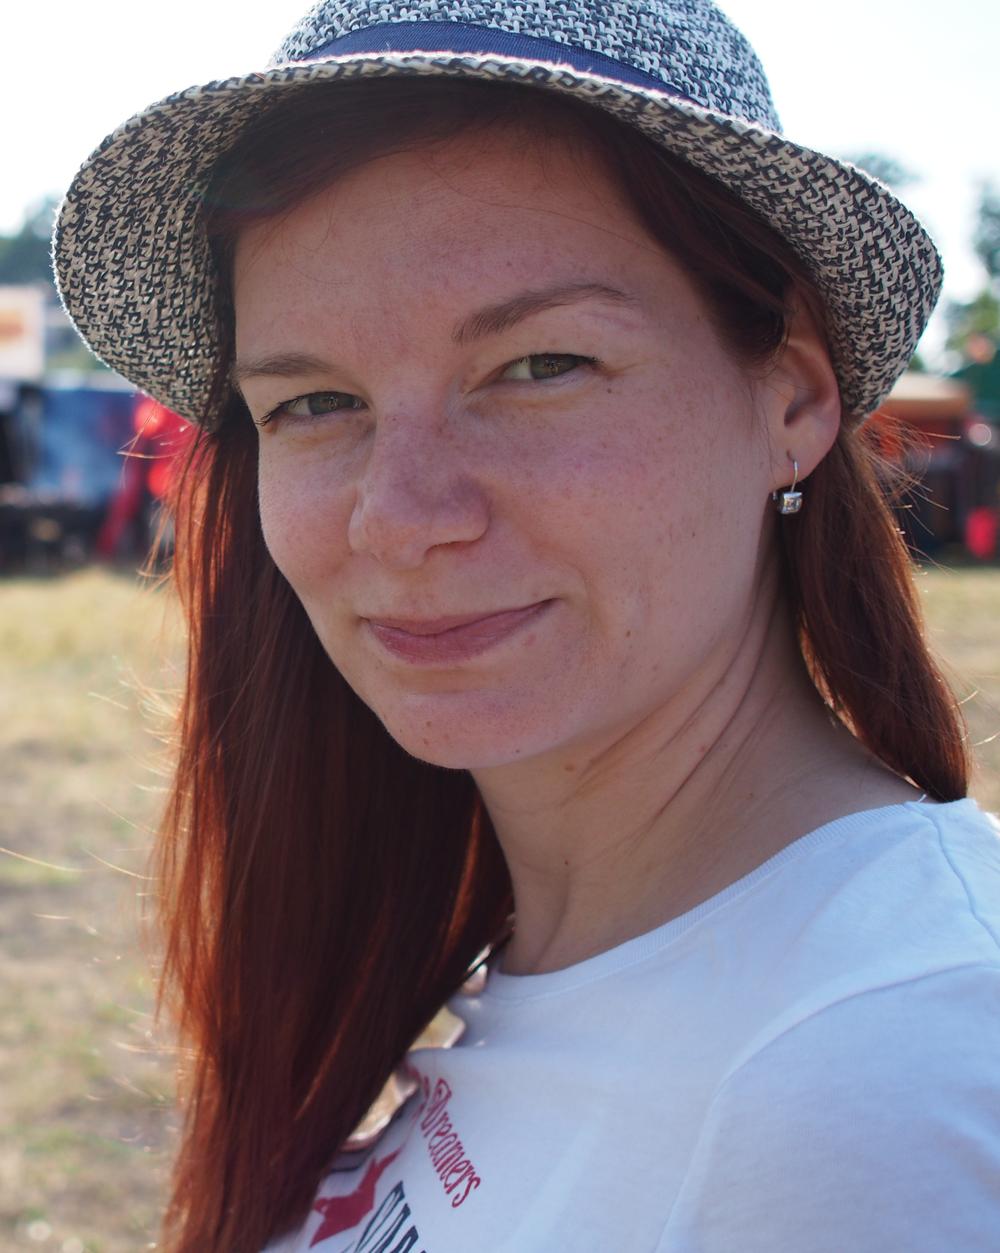 Betsy Jo Kellenbach. Massage Therapist at Massage in Wanaka.